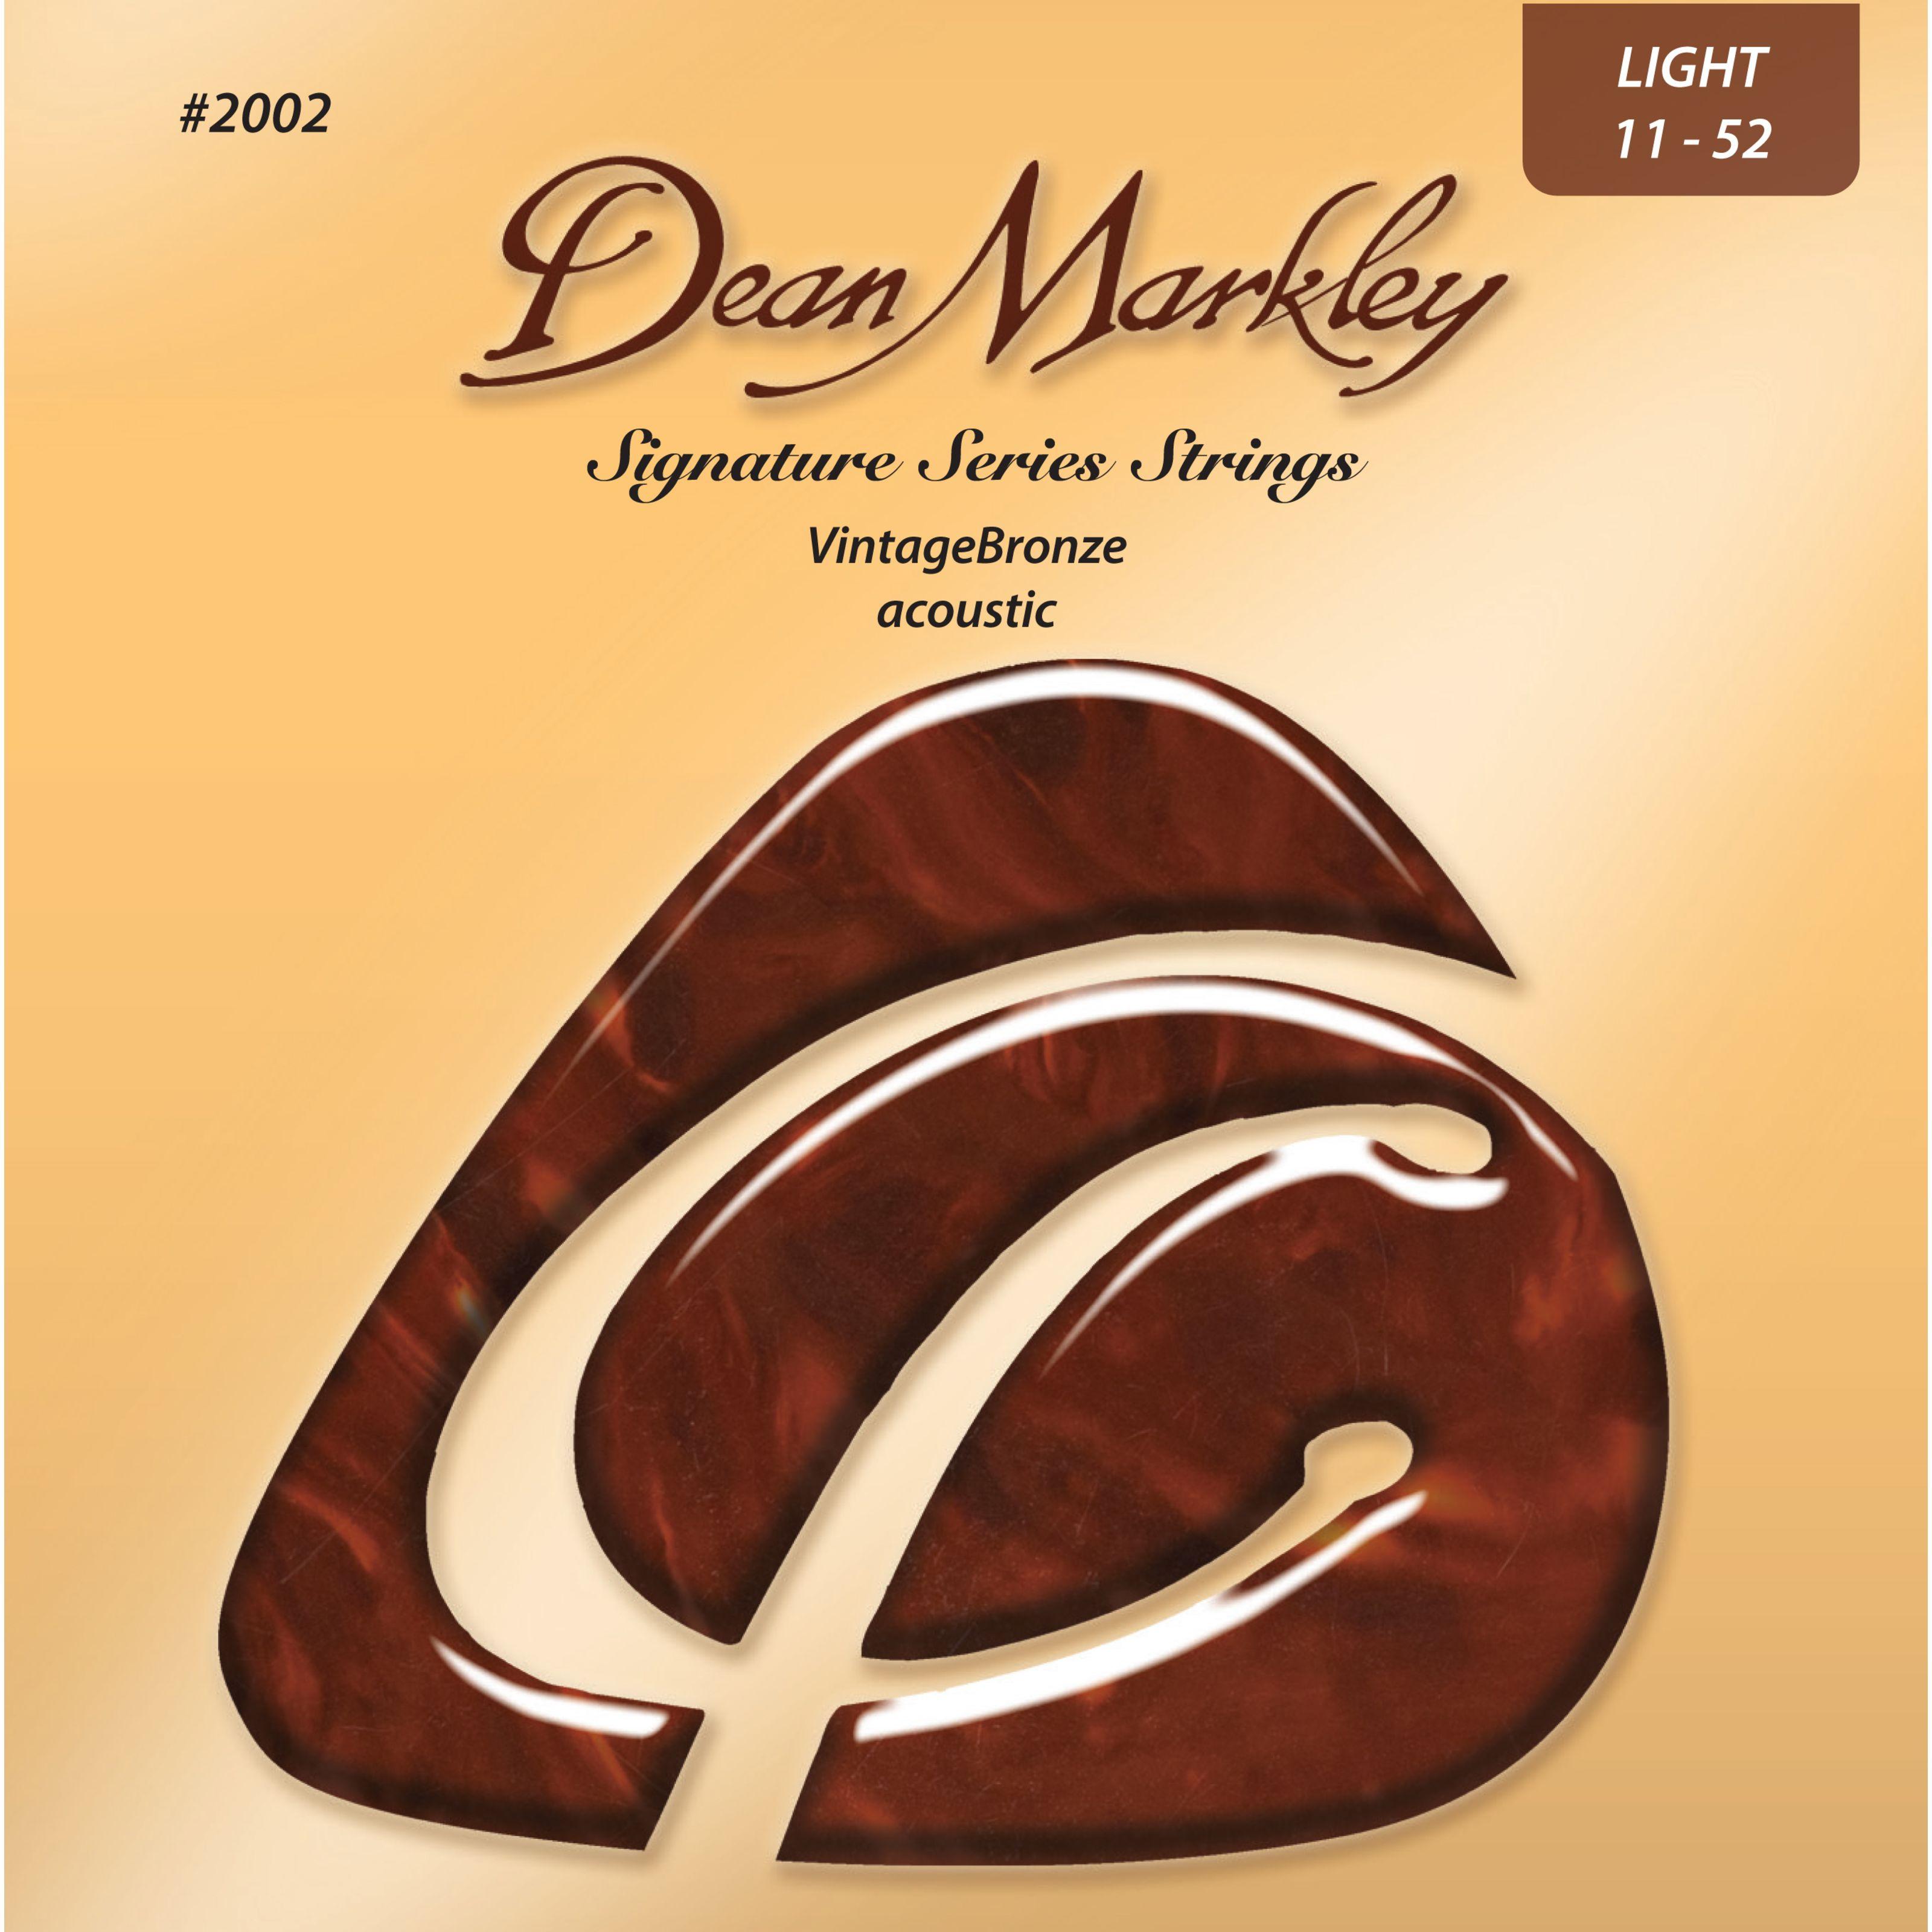 Dean Markley - A-Git.Saiten 11-52 2002 LT VintageBronze Acoustic DM2002